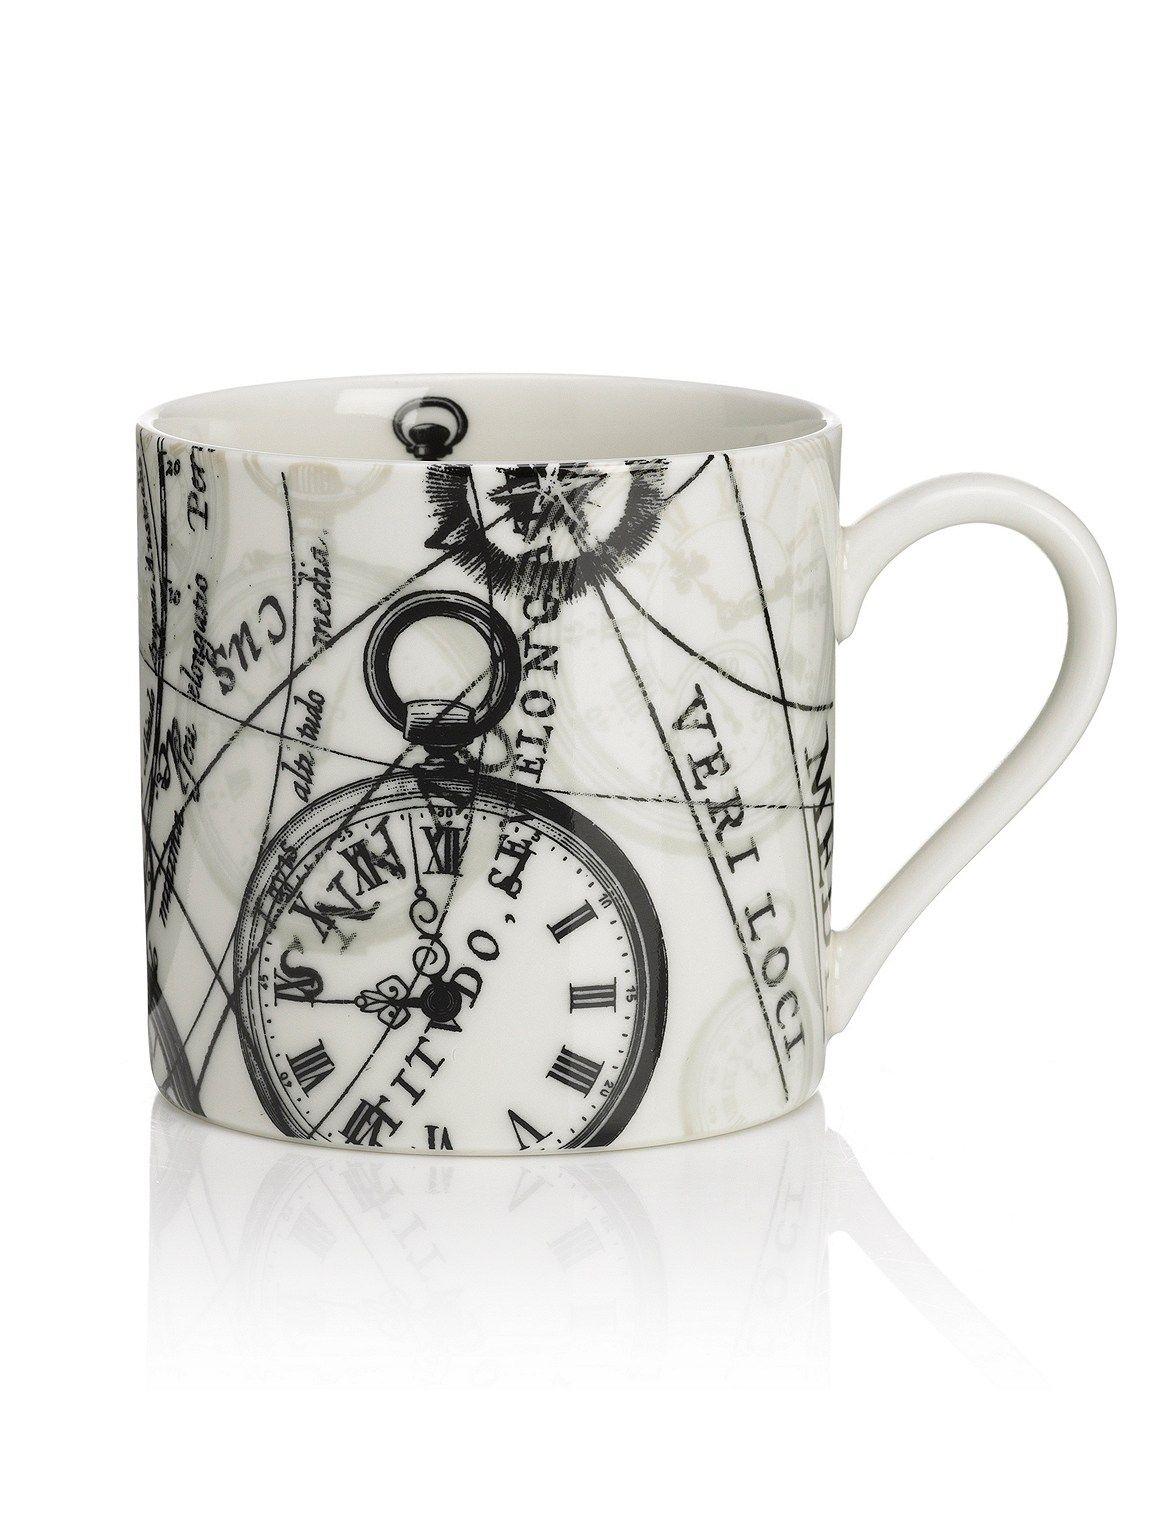 Time Travel Clocks Mug (With images) Travel clock, Mugs